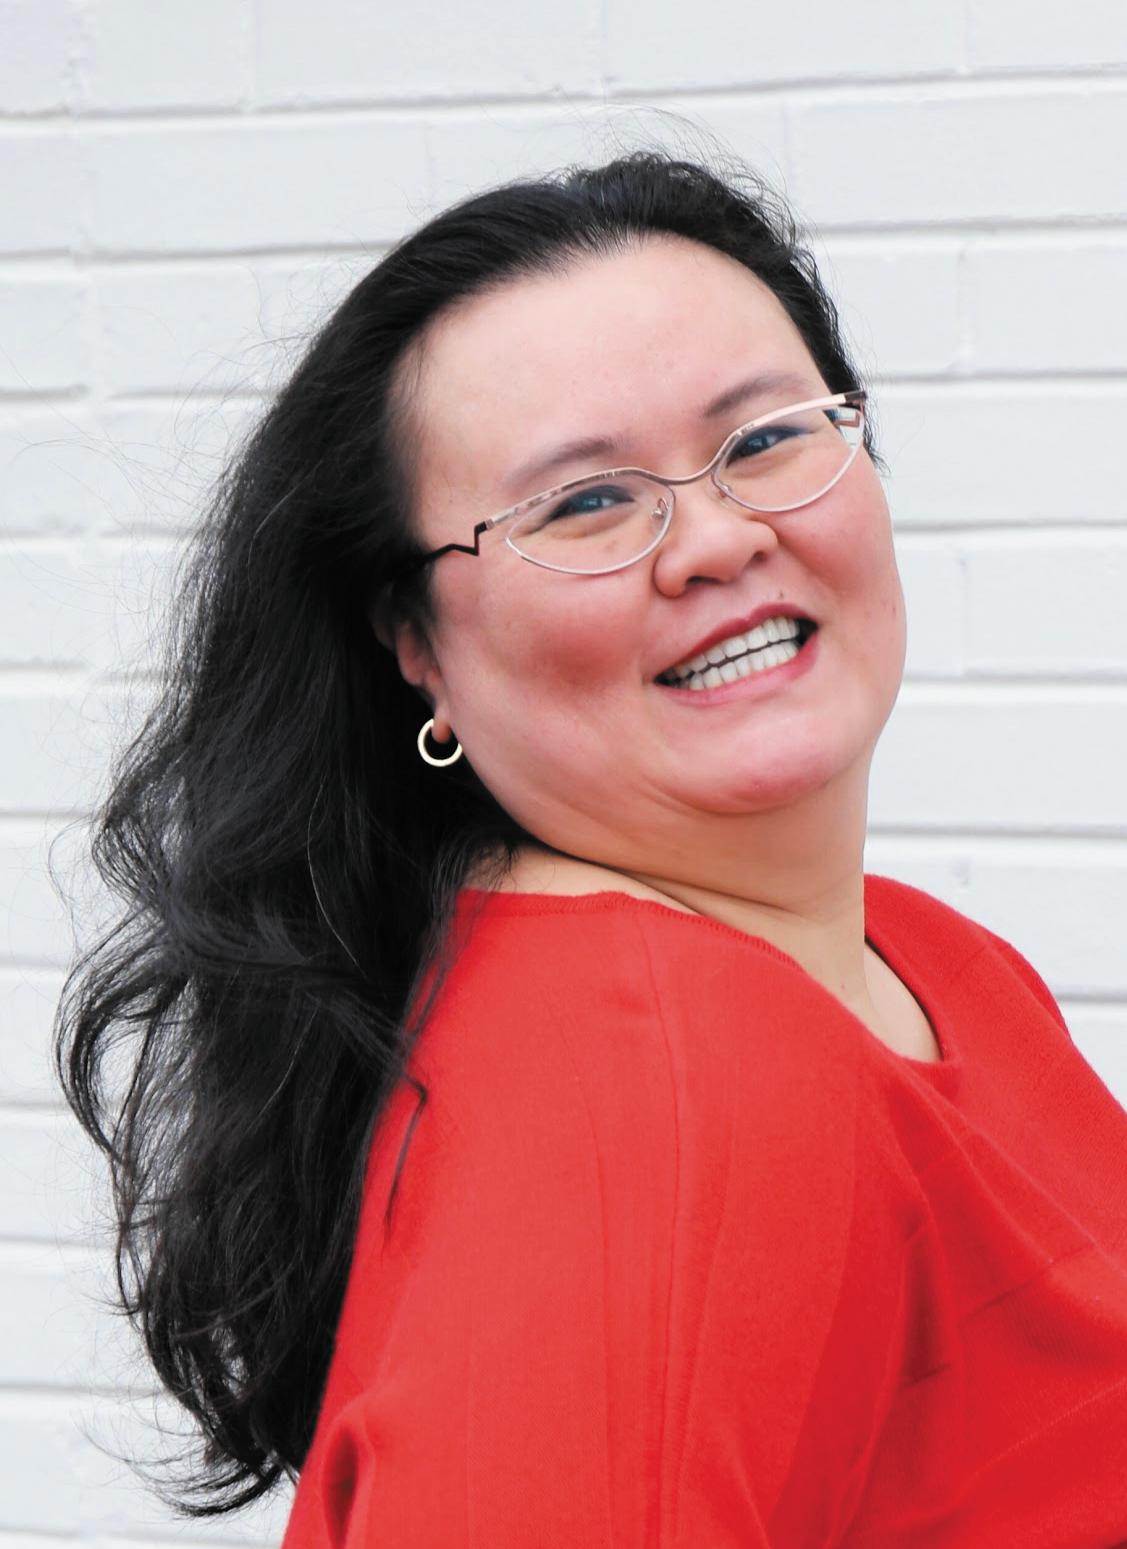 Thien-Kim Lam_Photo Courtesy of the Author